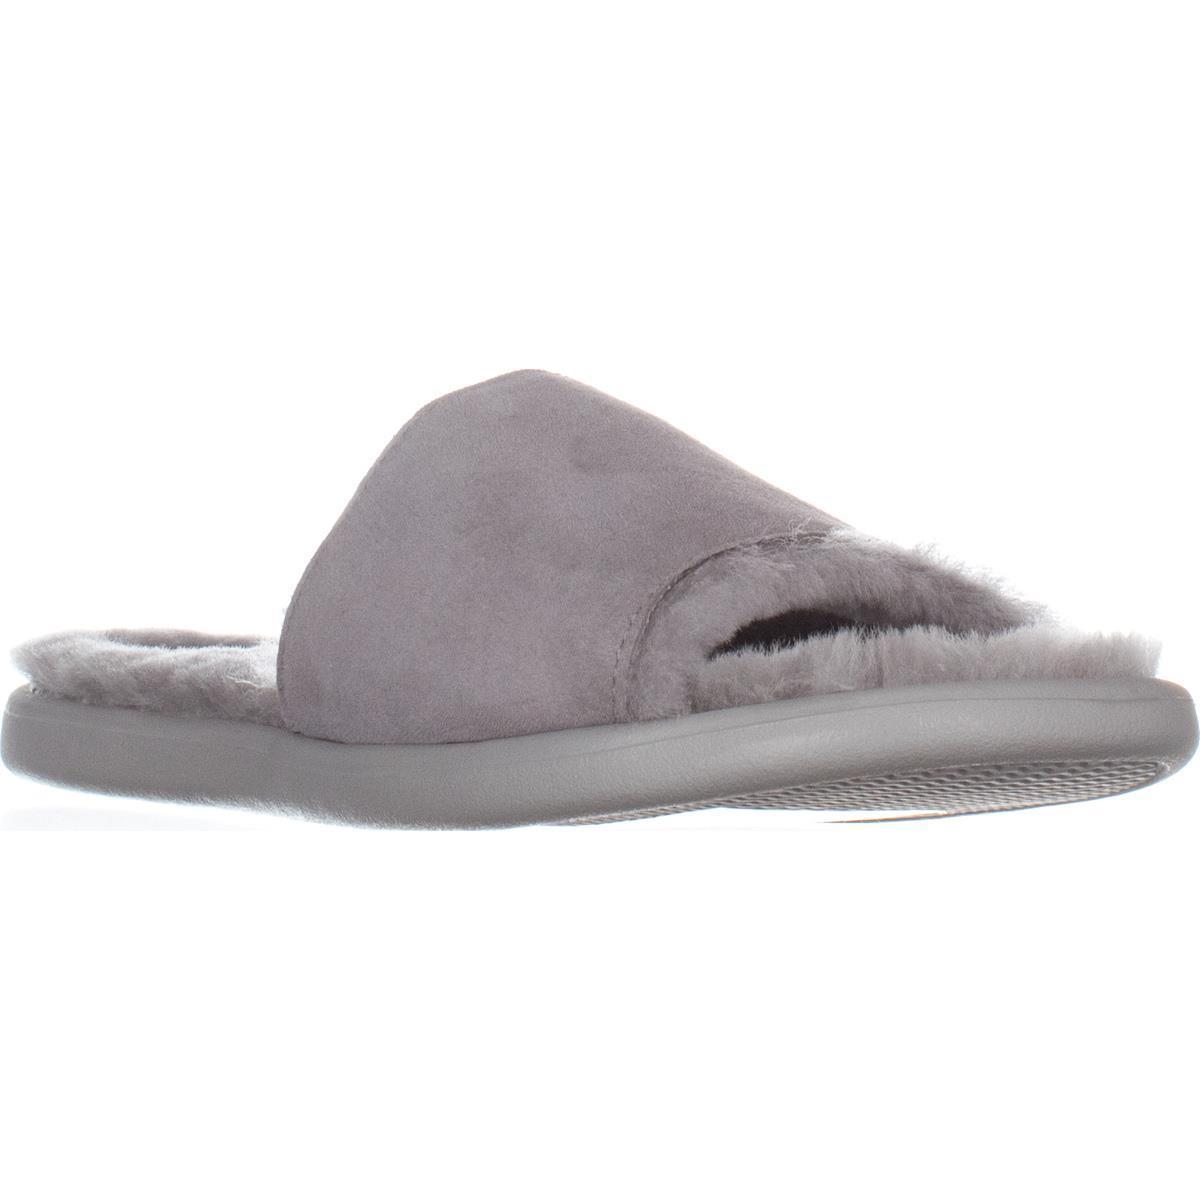 Womens UGG Australia Breezy Flat Slipper Sandals, Seal